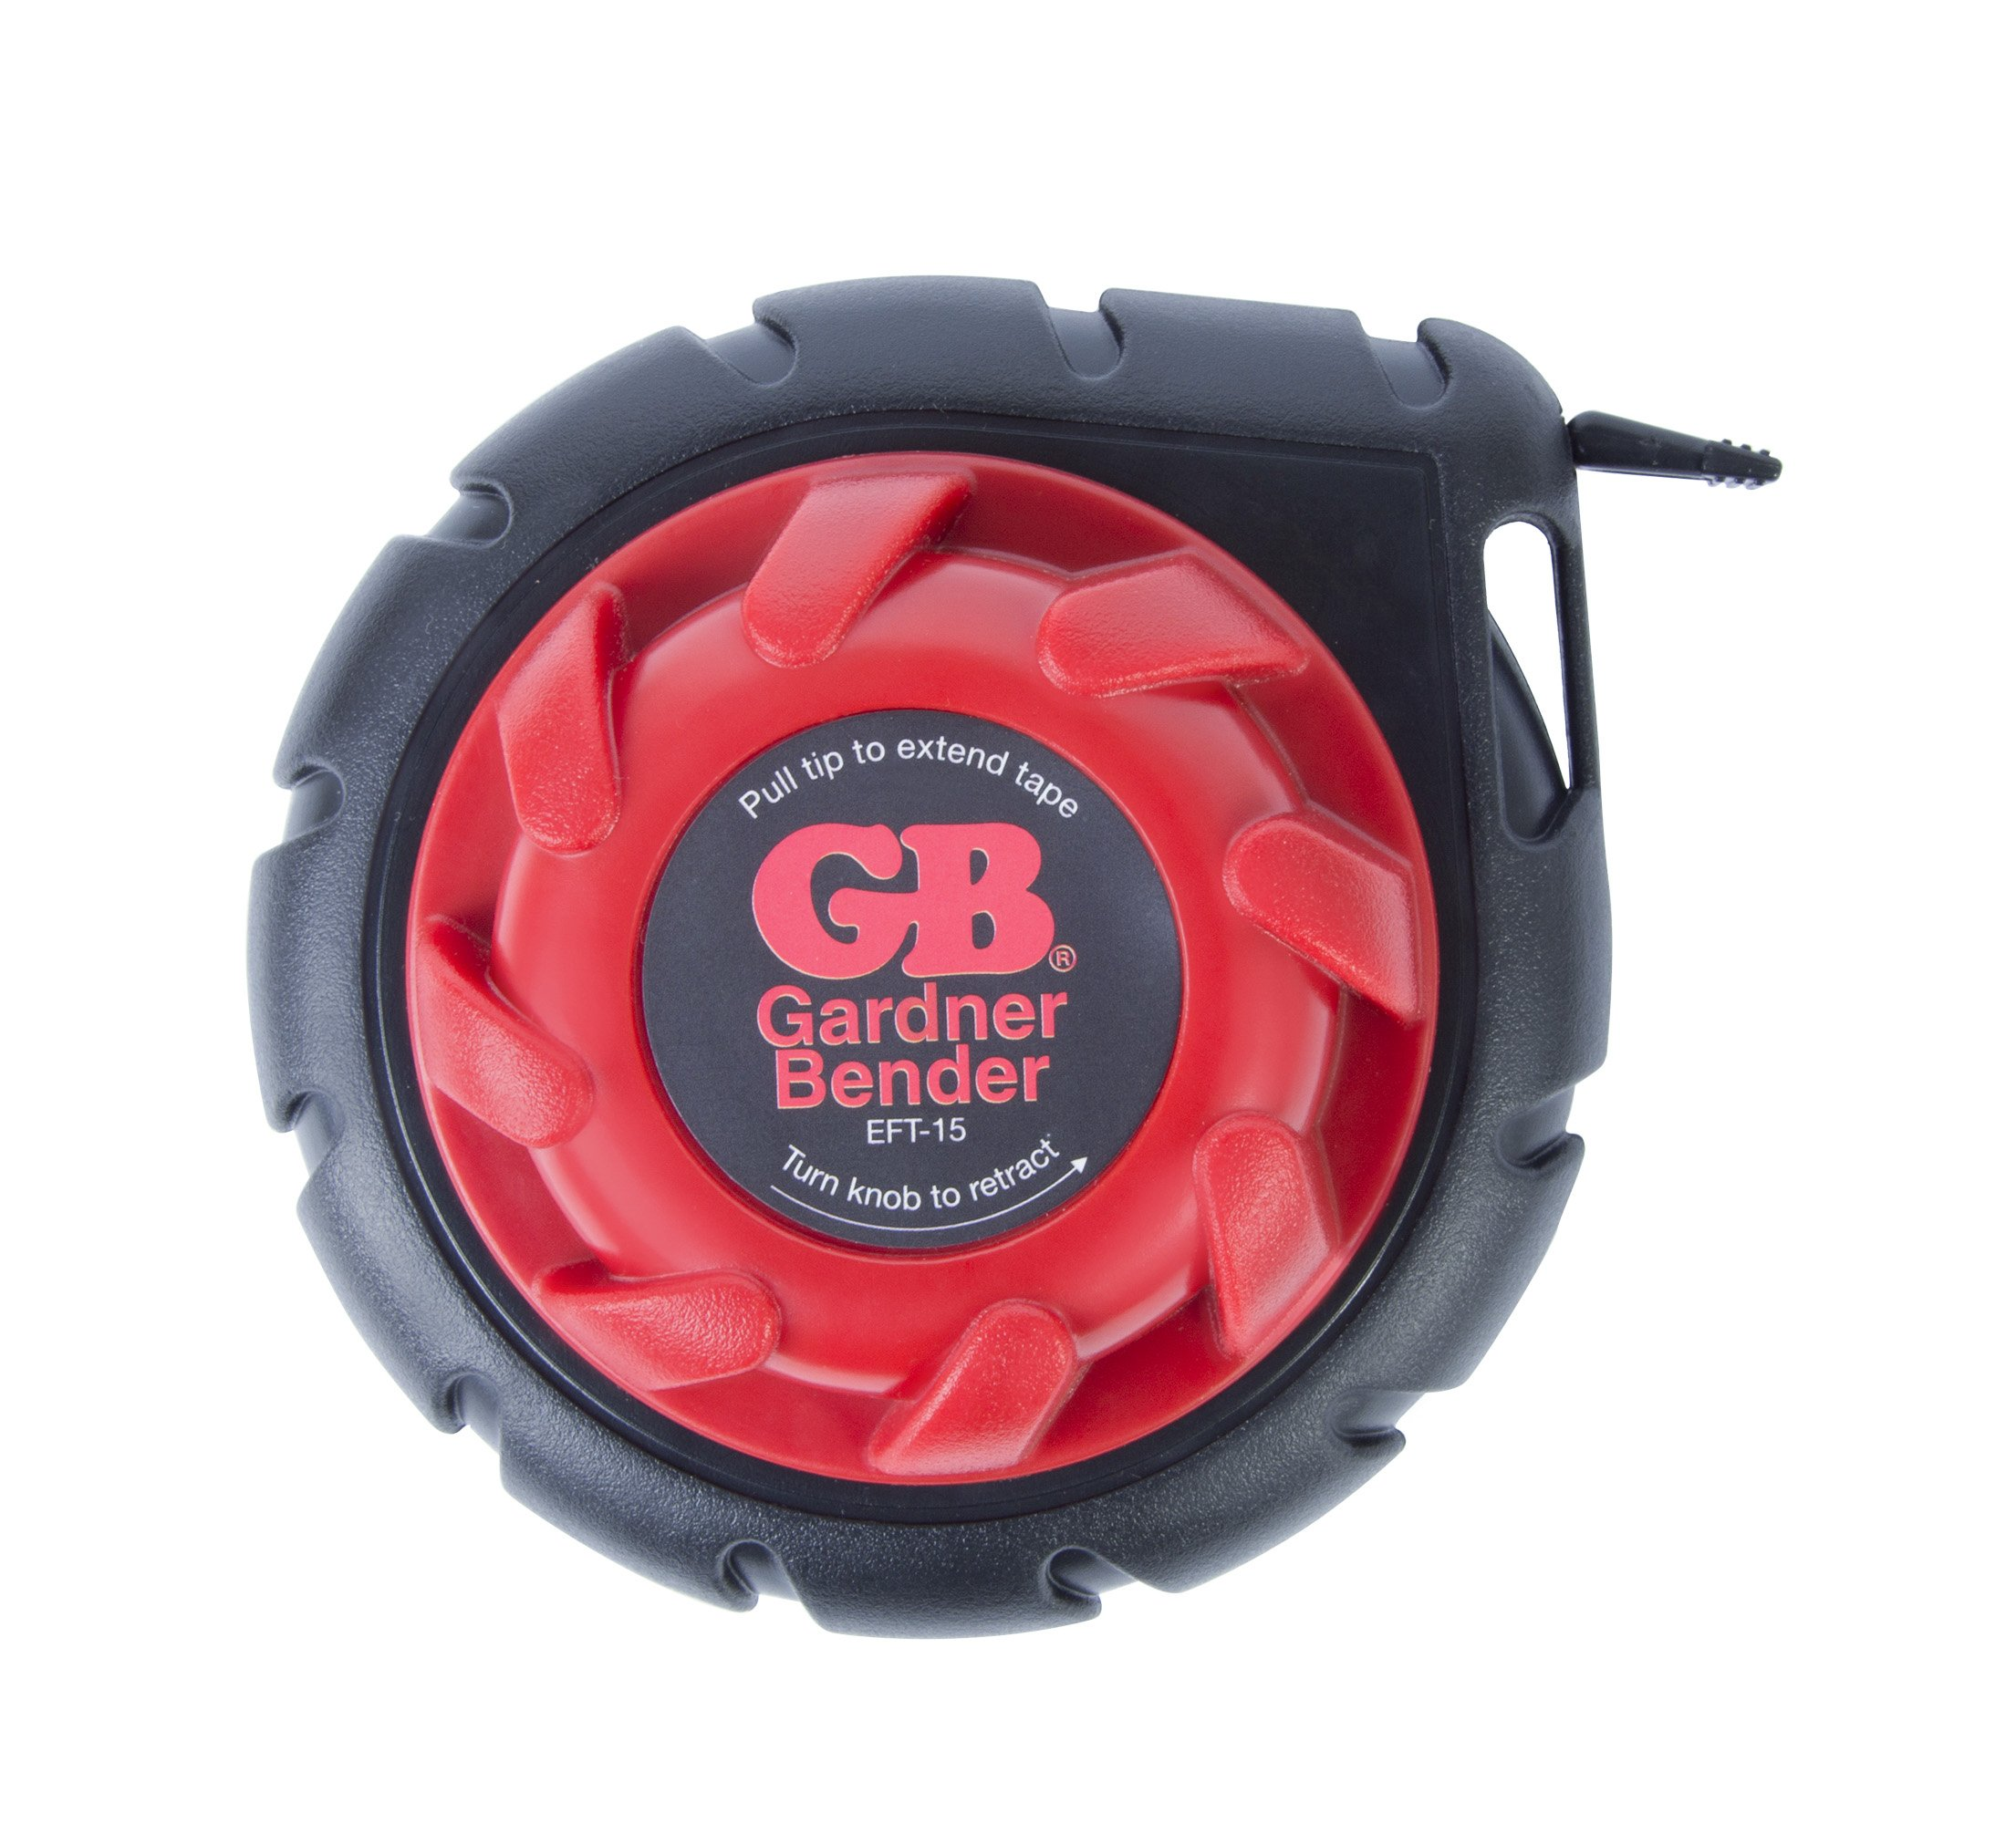 Gardner Bender EFT 15 Electrical Fishing